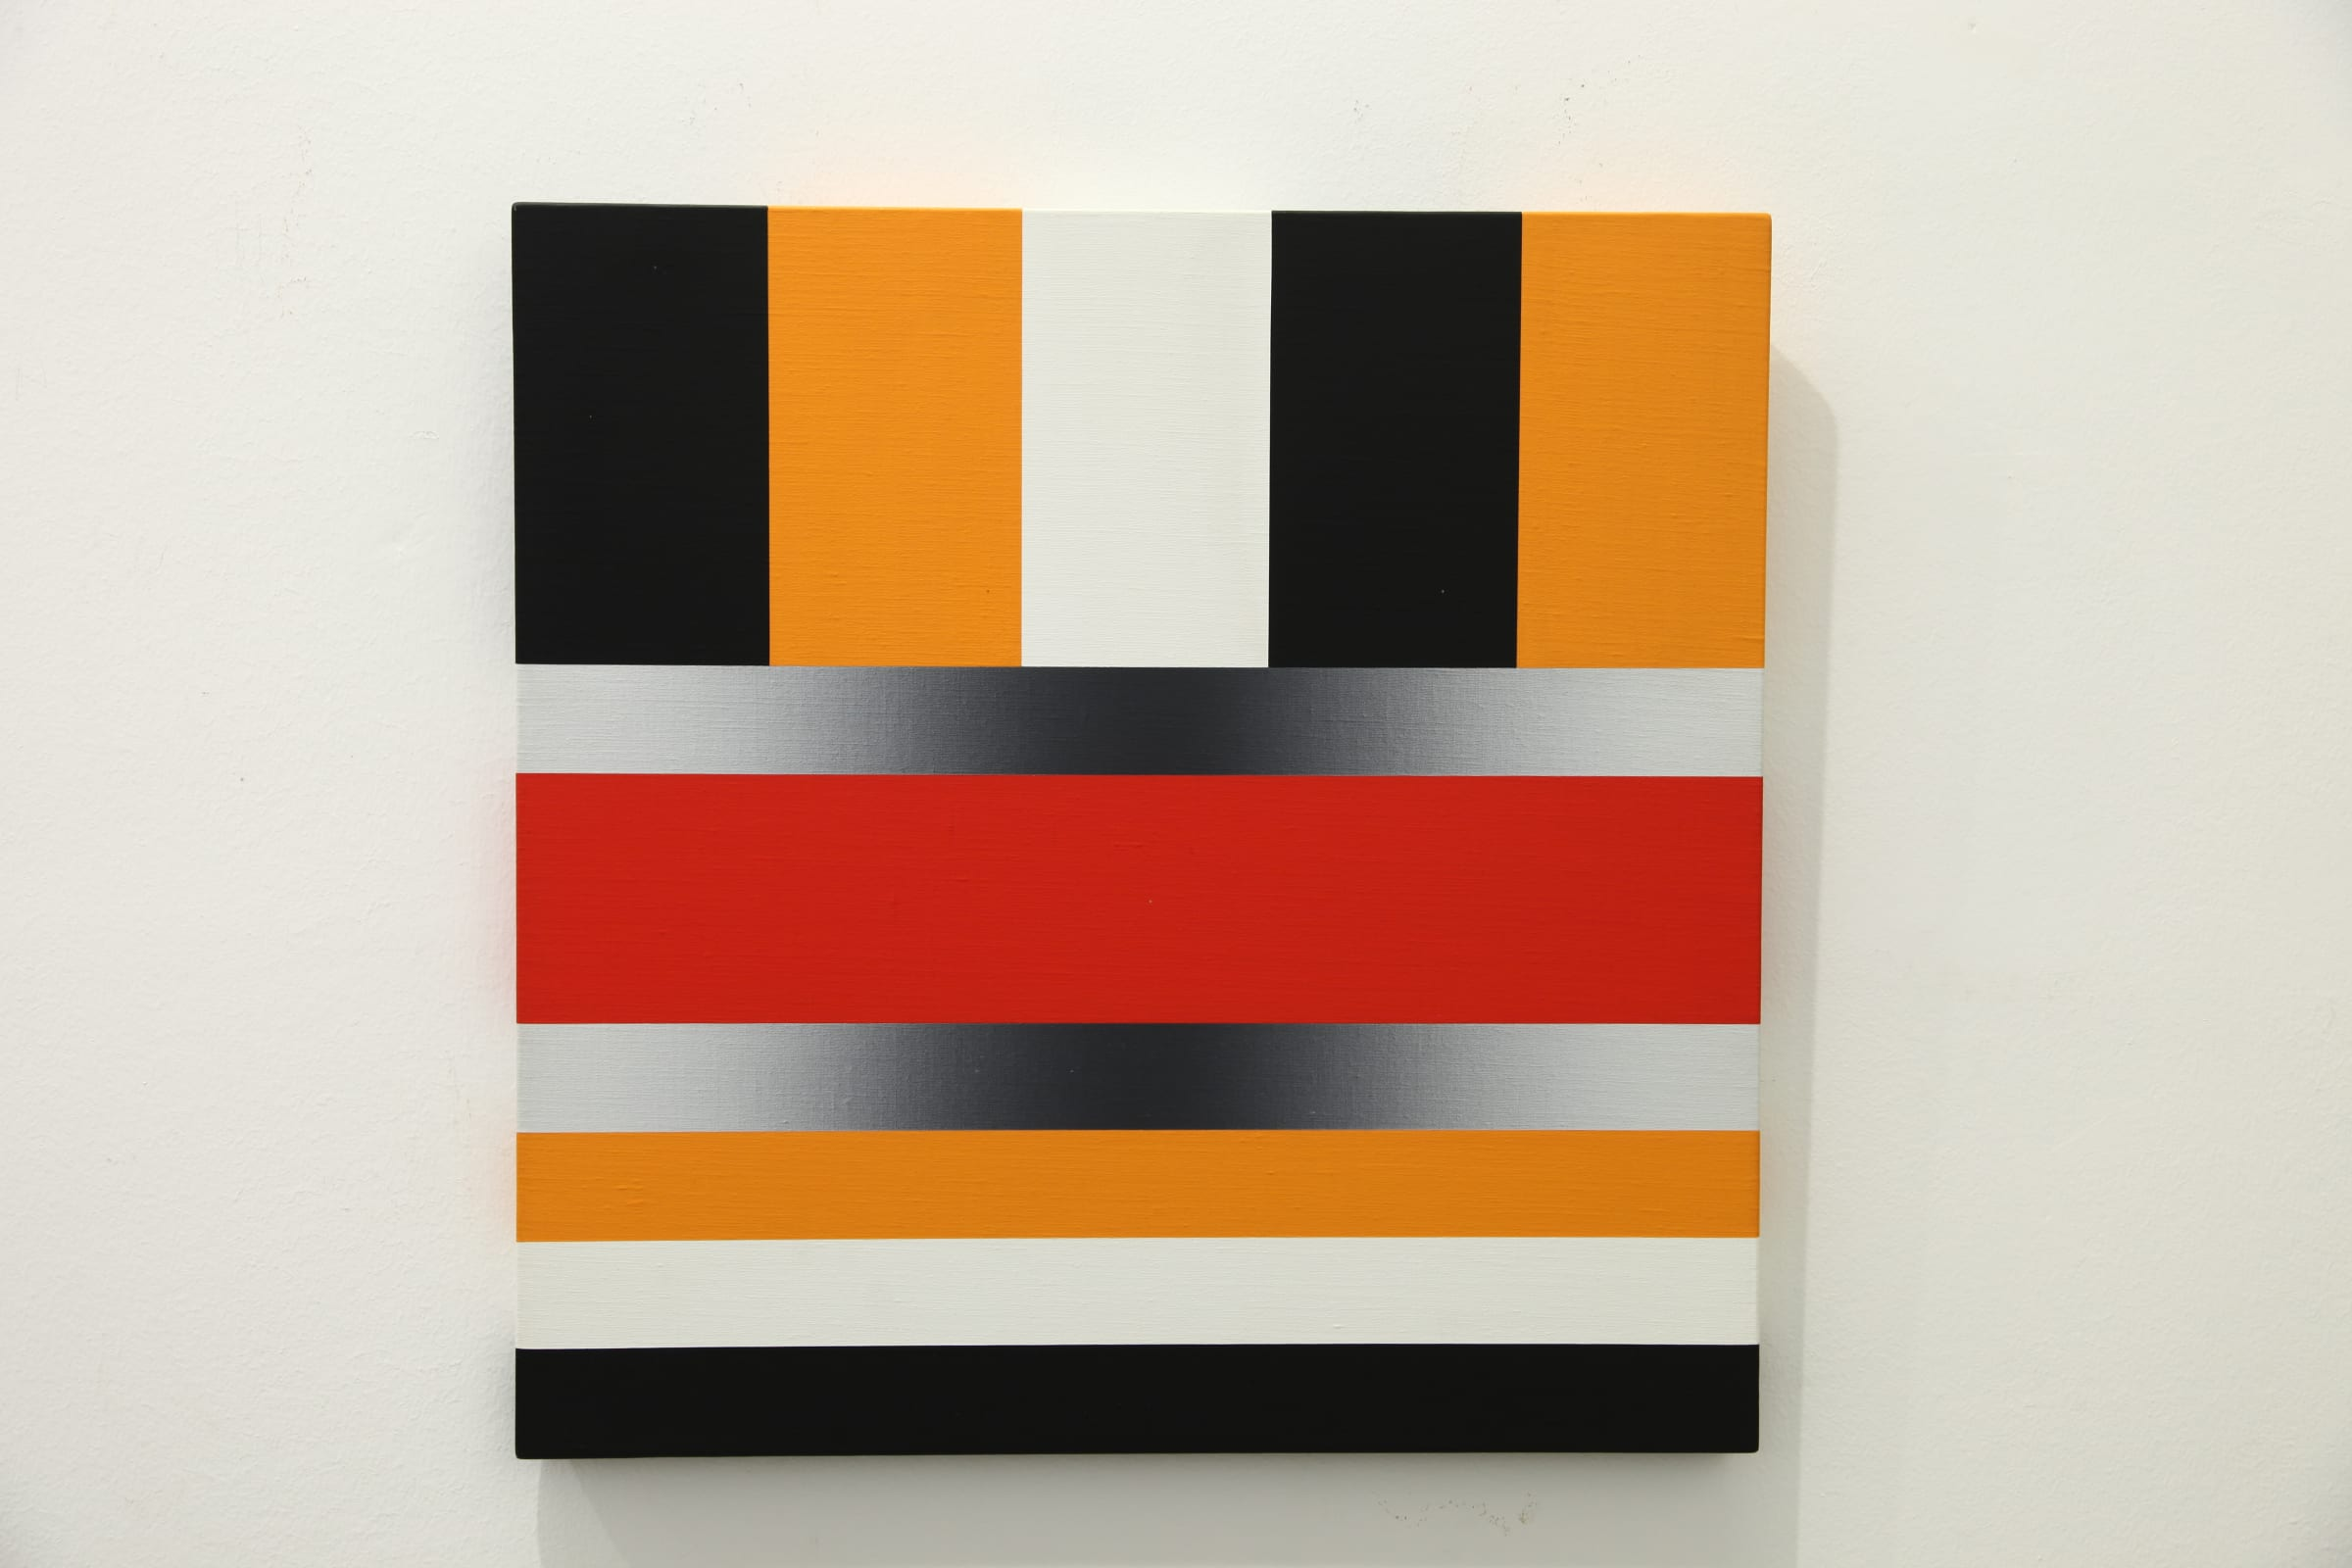 "<span class=""link fancybox-details-link""><a href=""/artists/30-giuliano-barbanti/works/301-giuliano-barbanti-soglia-alta-verticale-s-gc-779-1992/"">View Detail Page</a></span><div class=""artist""><strong>Giuliano Barbanti</strong></div> <div class=""title""><em>Soglia alta verticale S/gc 779</em>, 1992</div> <div class=""medium"">acrilico su tela</div> <div class=""dimensions"">cm 60x60</div>"